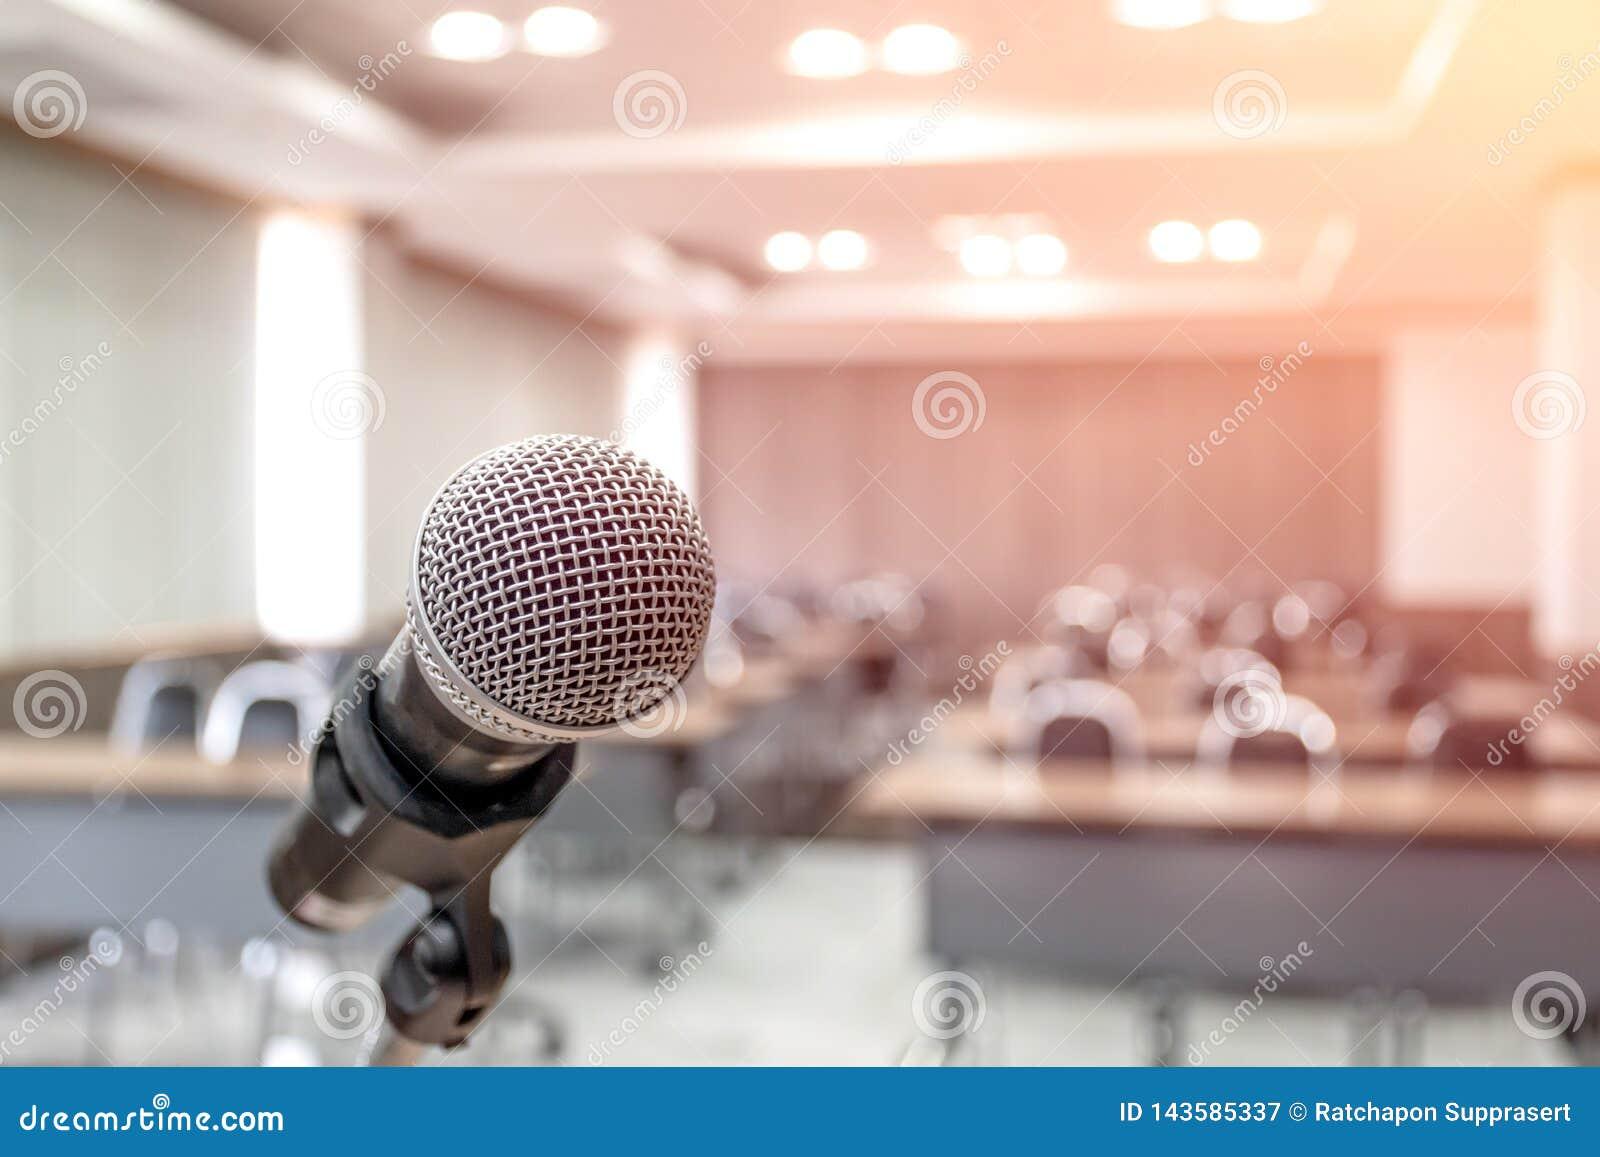 Microfoon op samenvatting vaag van toespraak in seminarieruimte